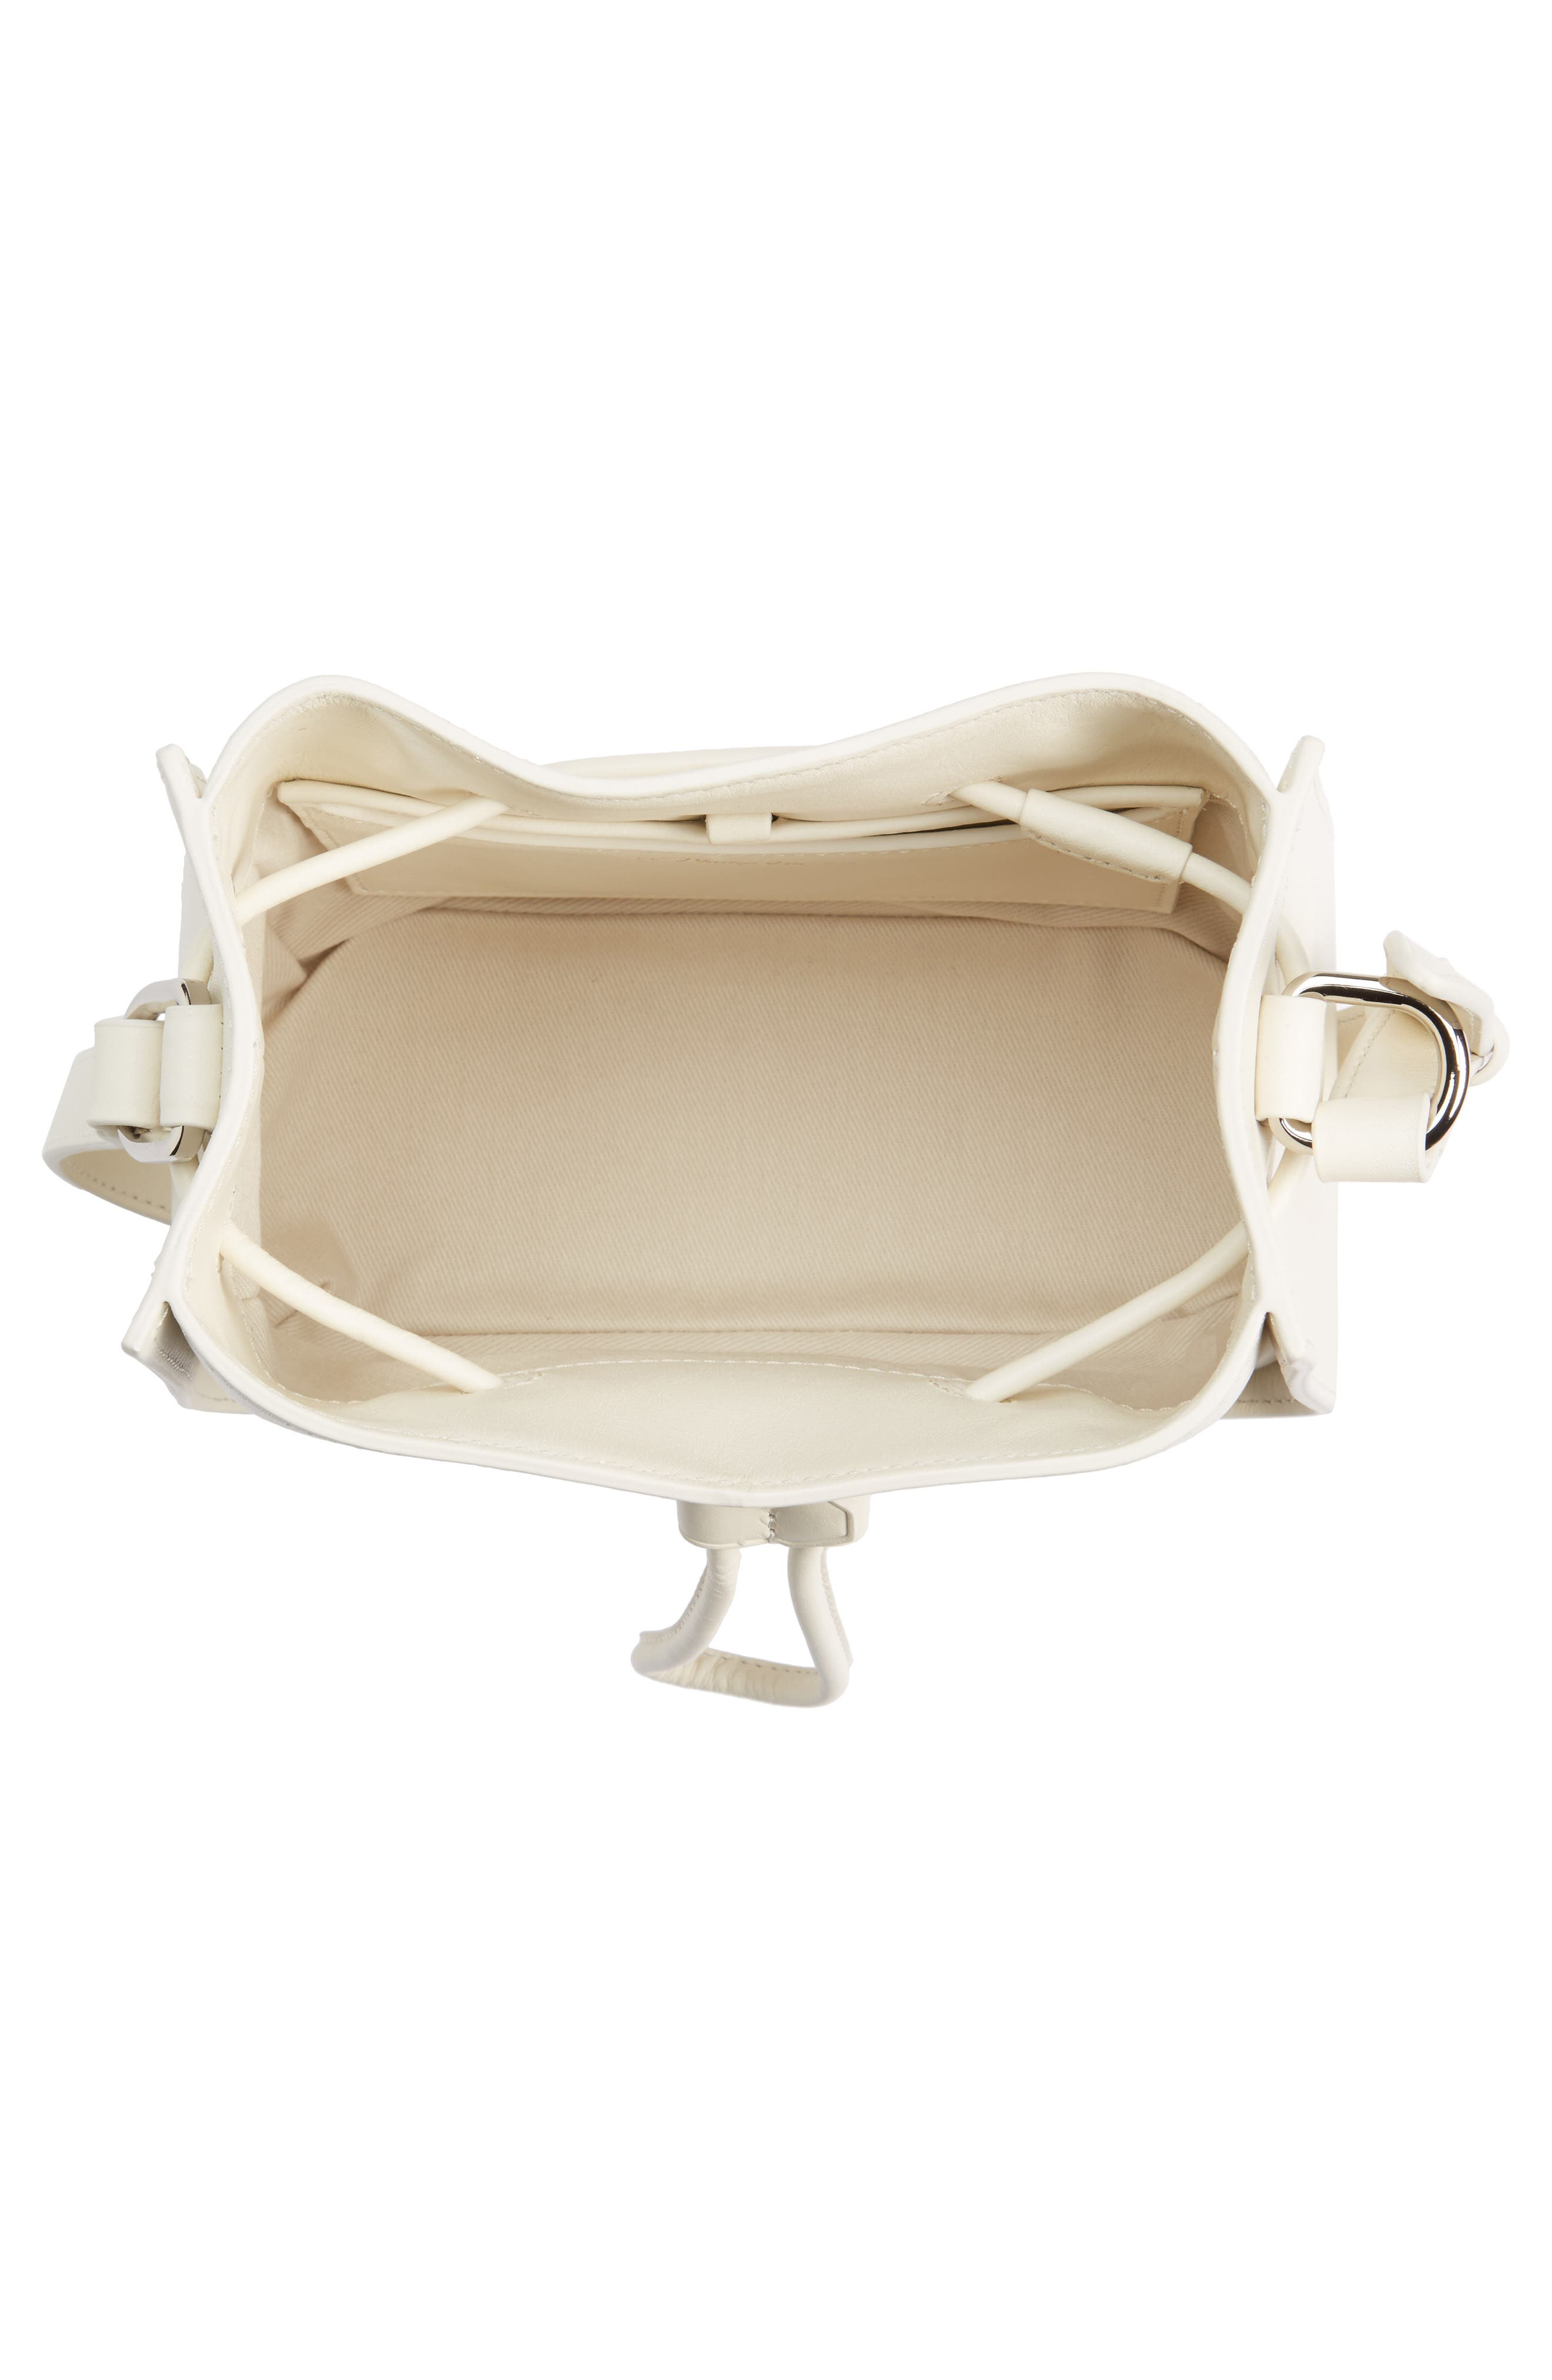 Alternate Image 3  - 3.1 Phillip Lim Mini Soleil Leather Bucket Bag